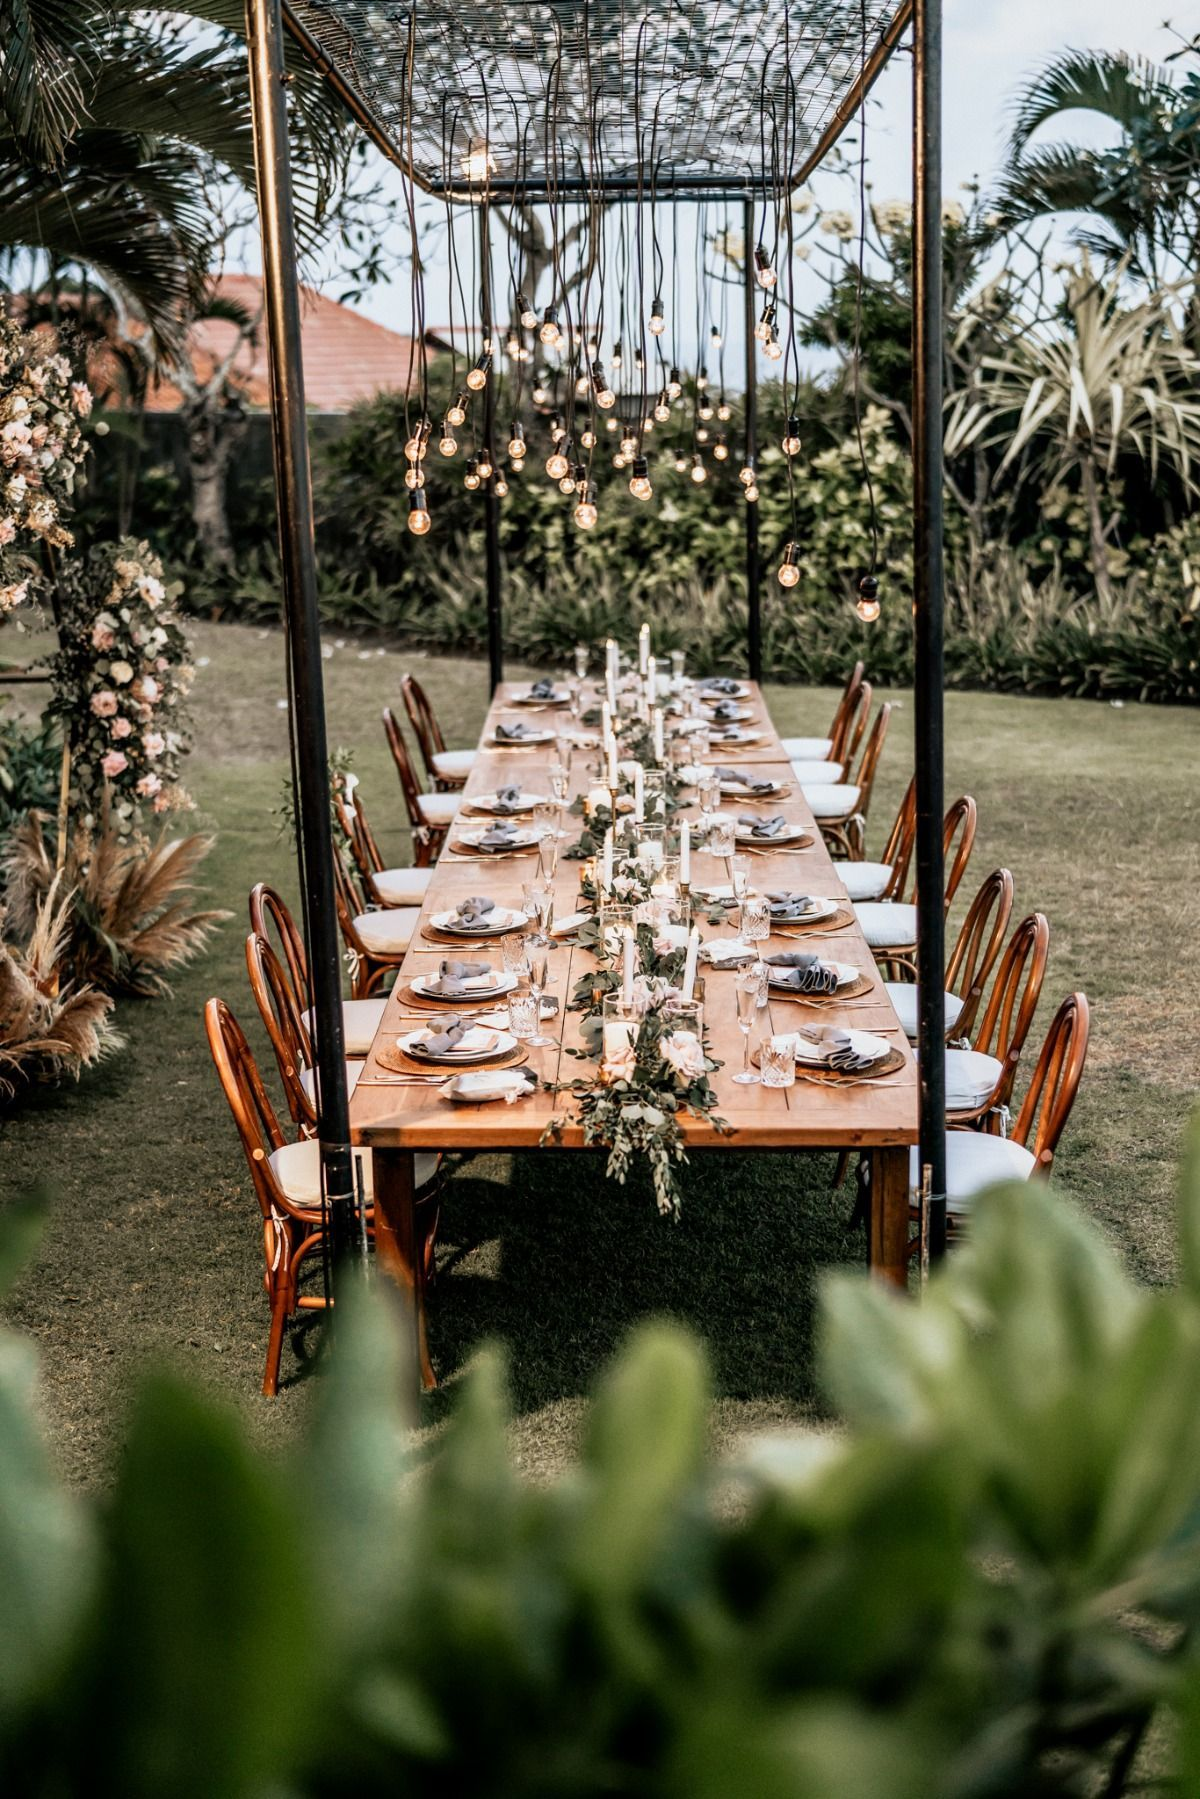 Teeny Tiny Bali Wedding In 2020 Very Small Wedding Small Destination Weddings Small Outdoor Wedding